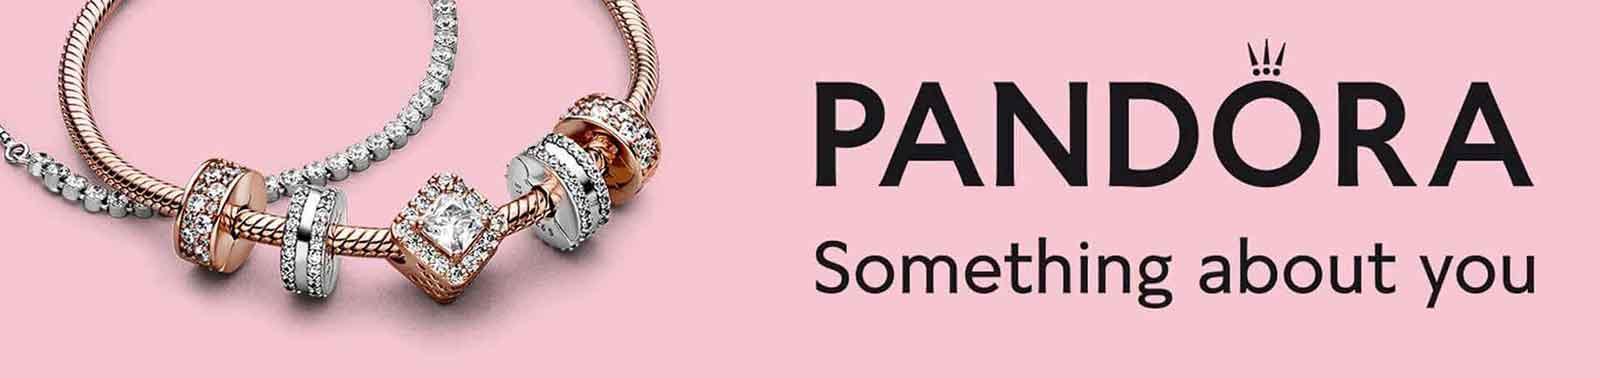 Pandora Ostern